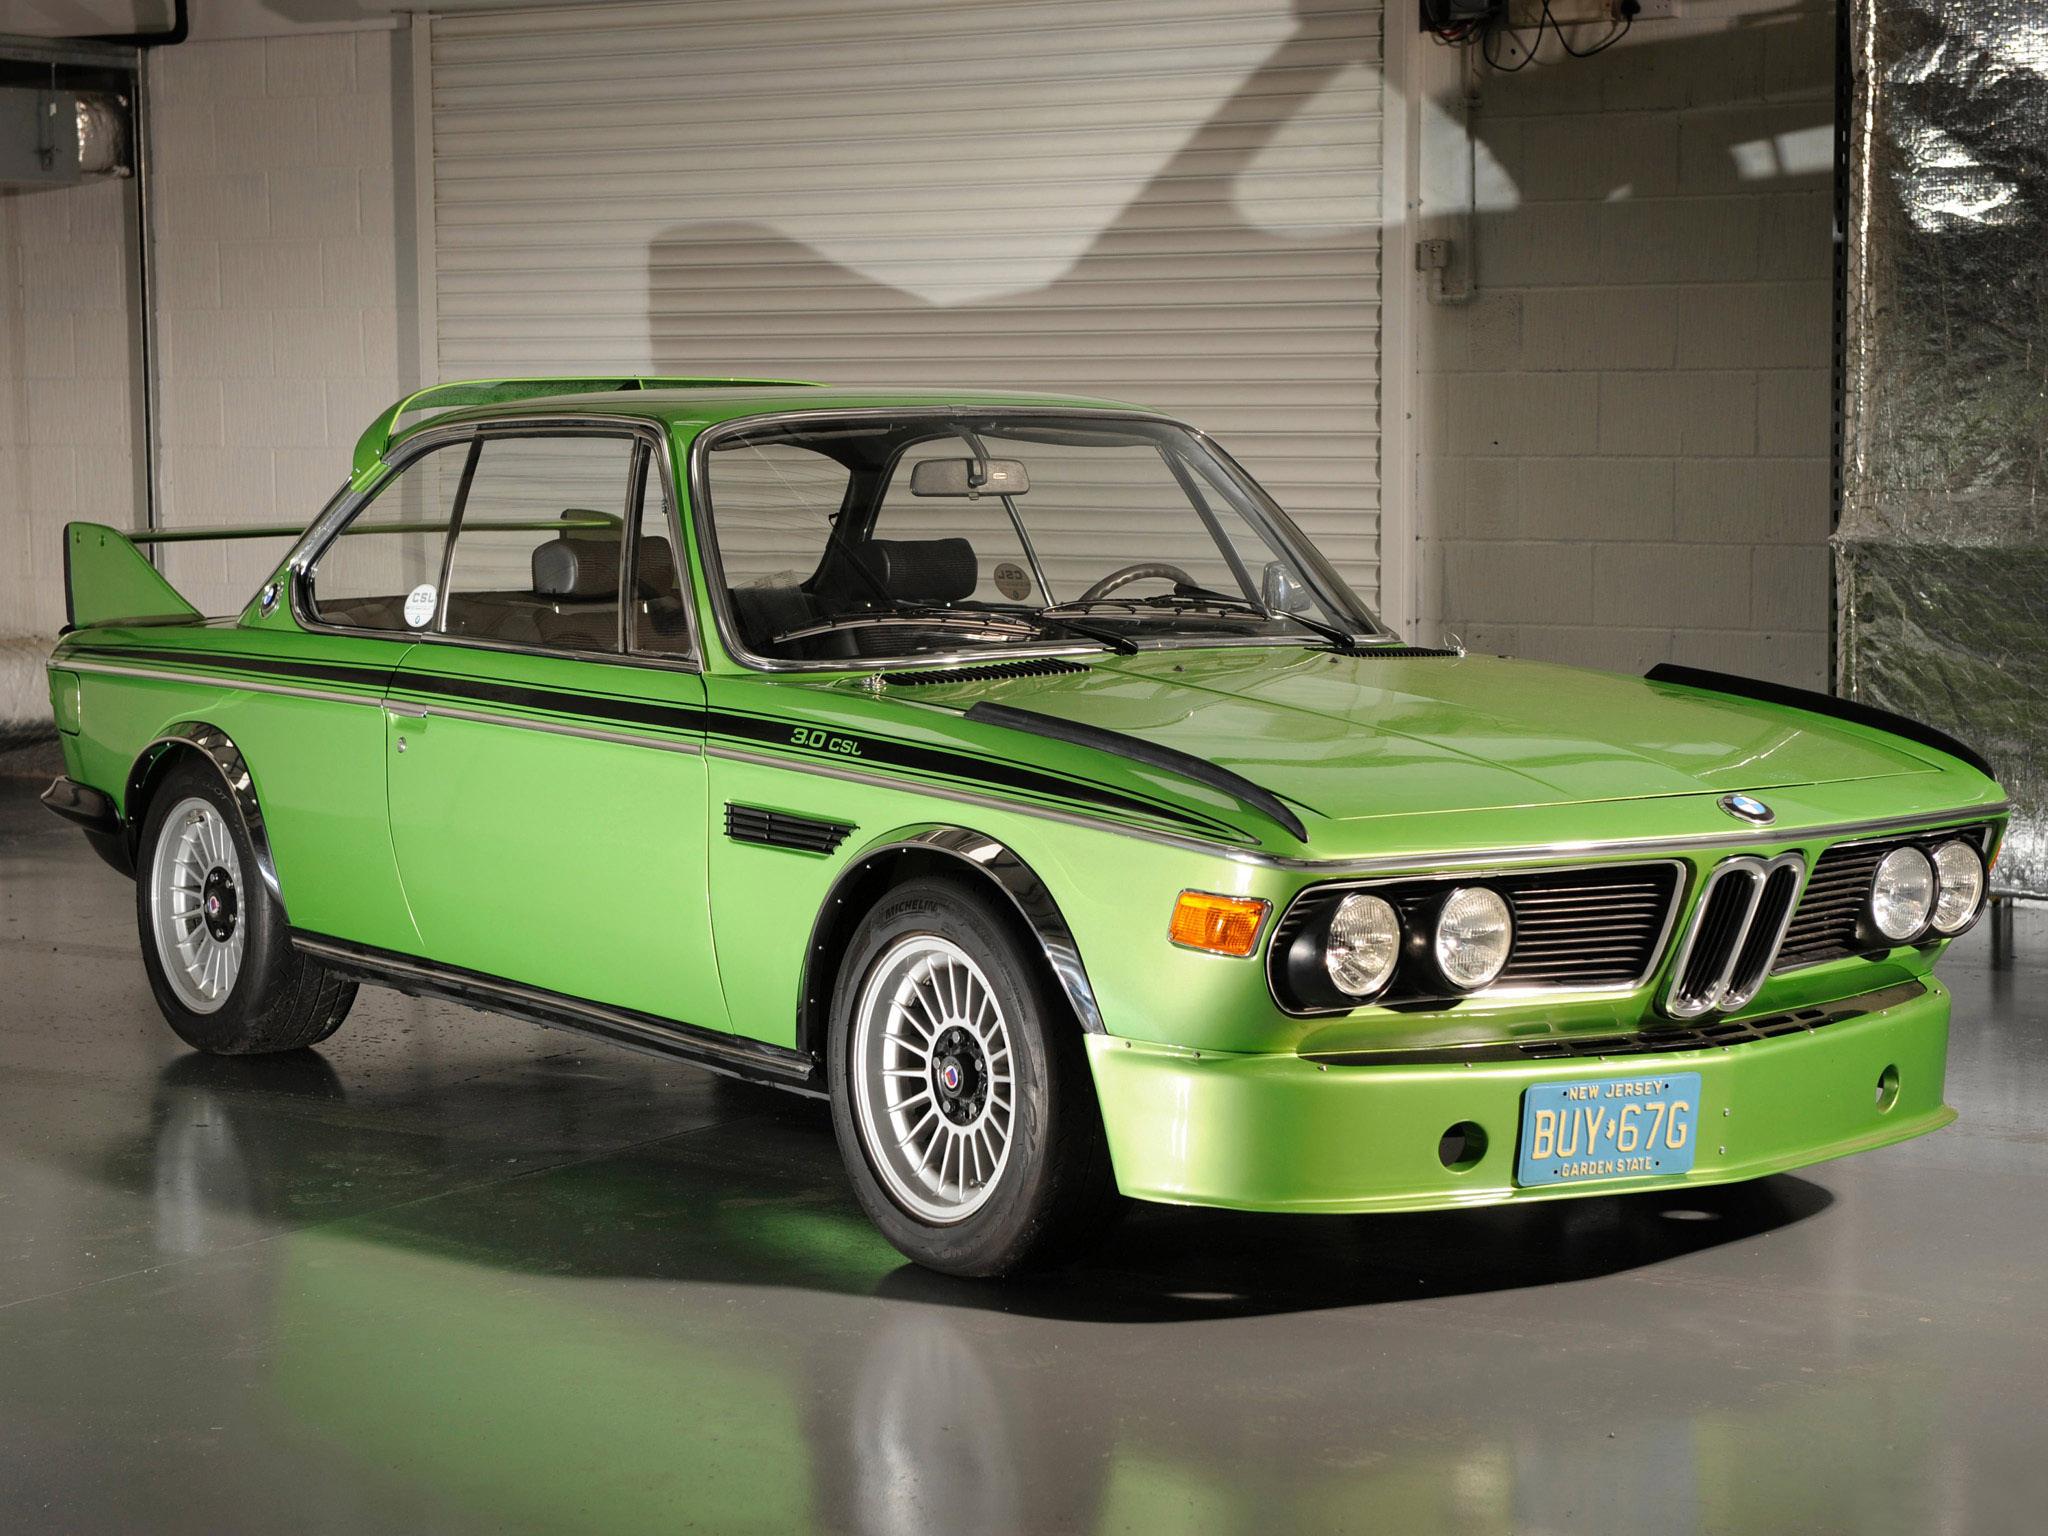 Talk about a green car.